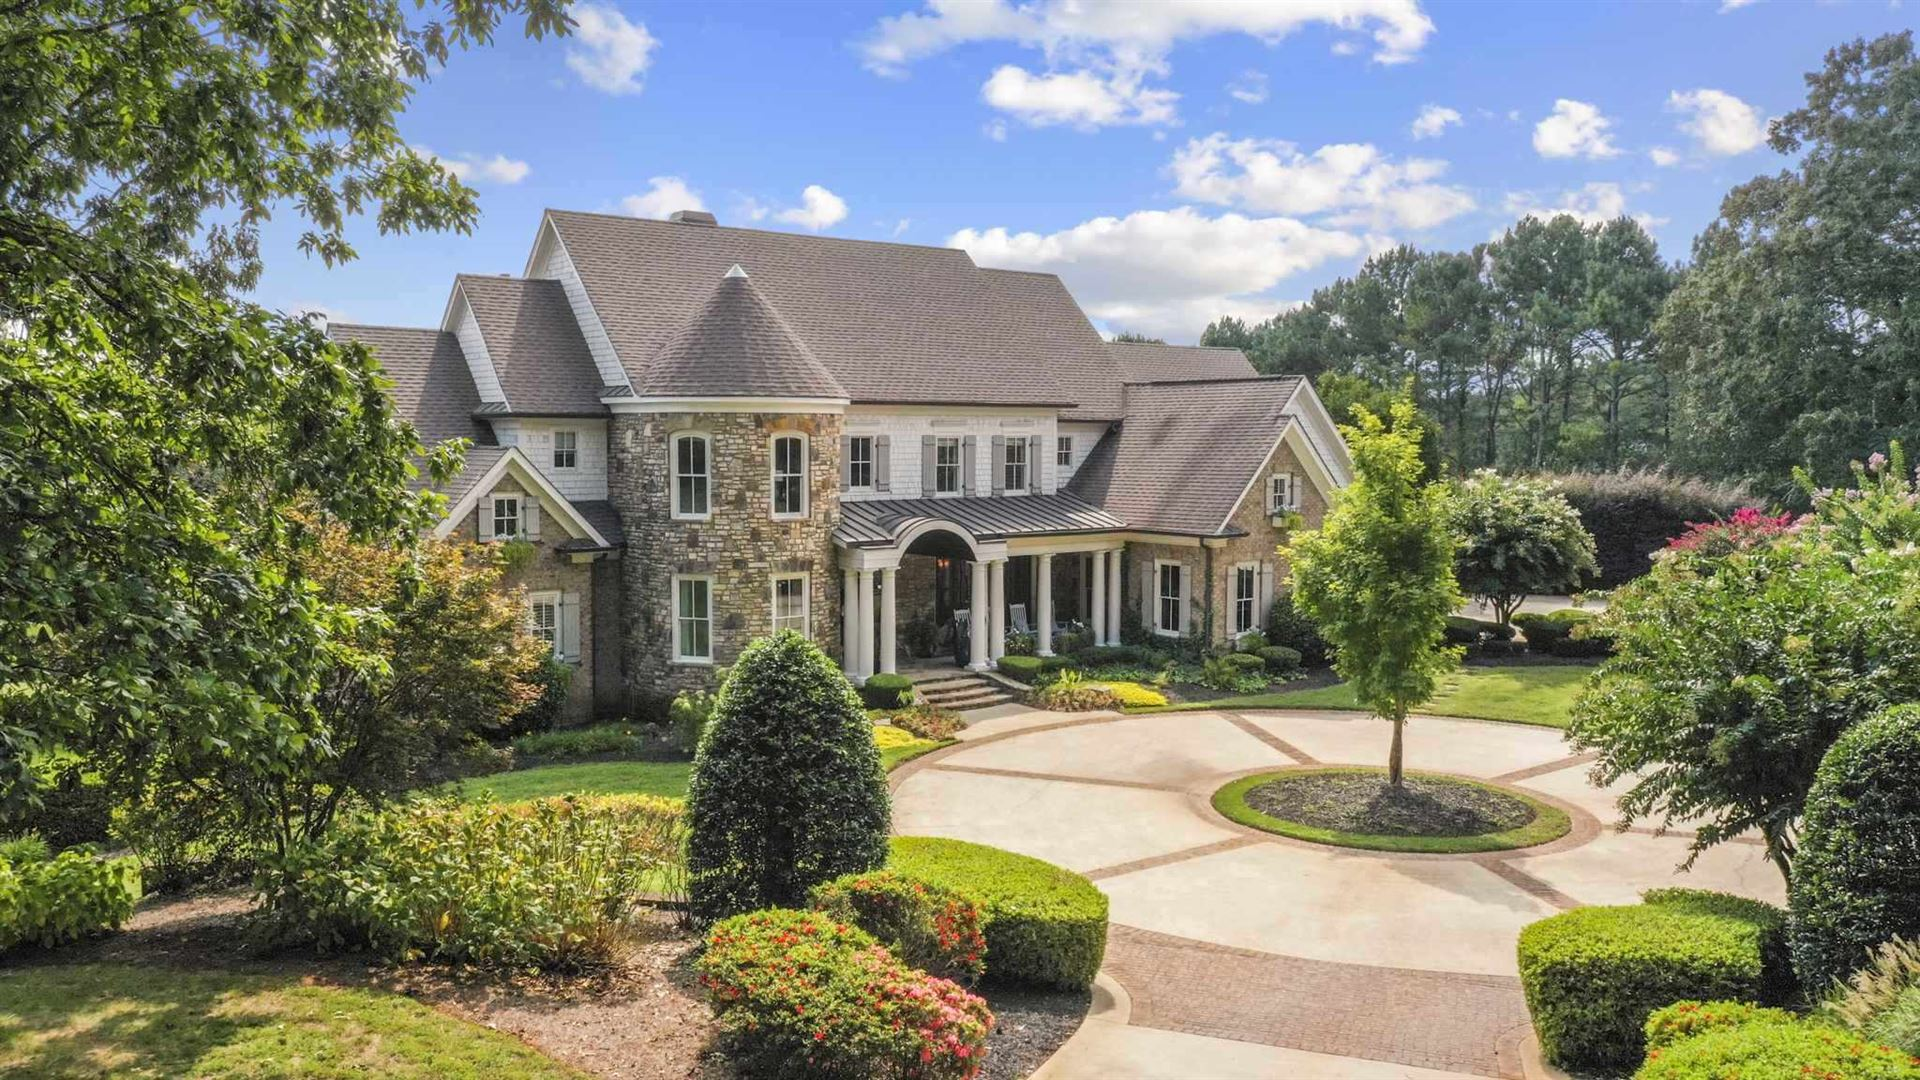 16168 Hopewell Rd, Milton, GA 30004 - MLS#: 8780322